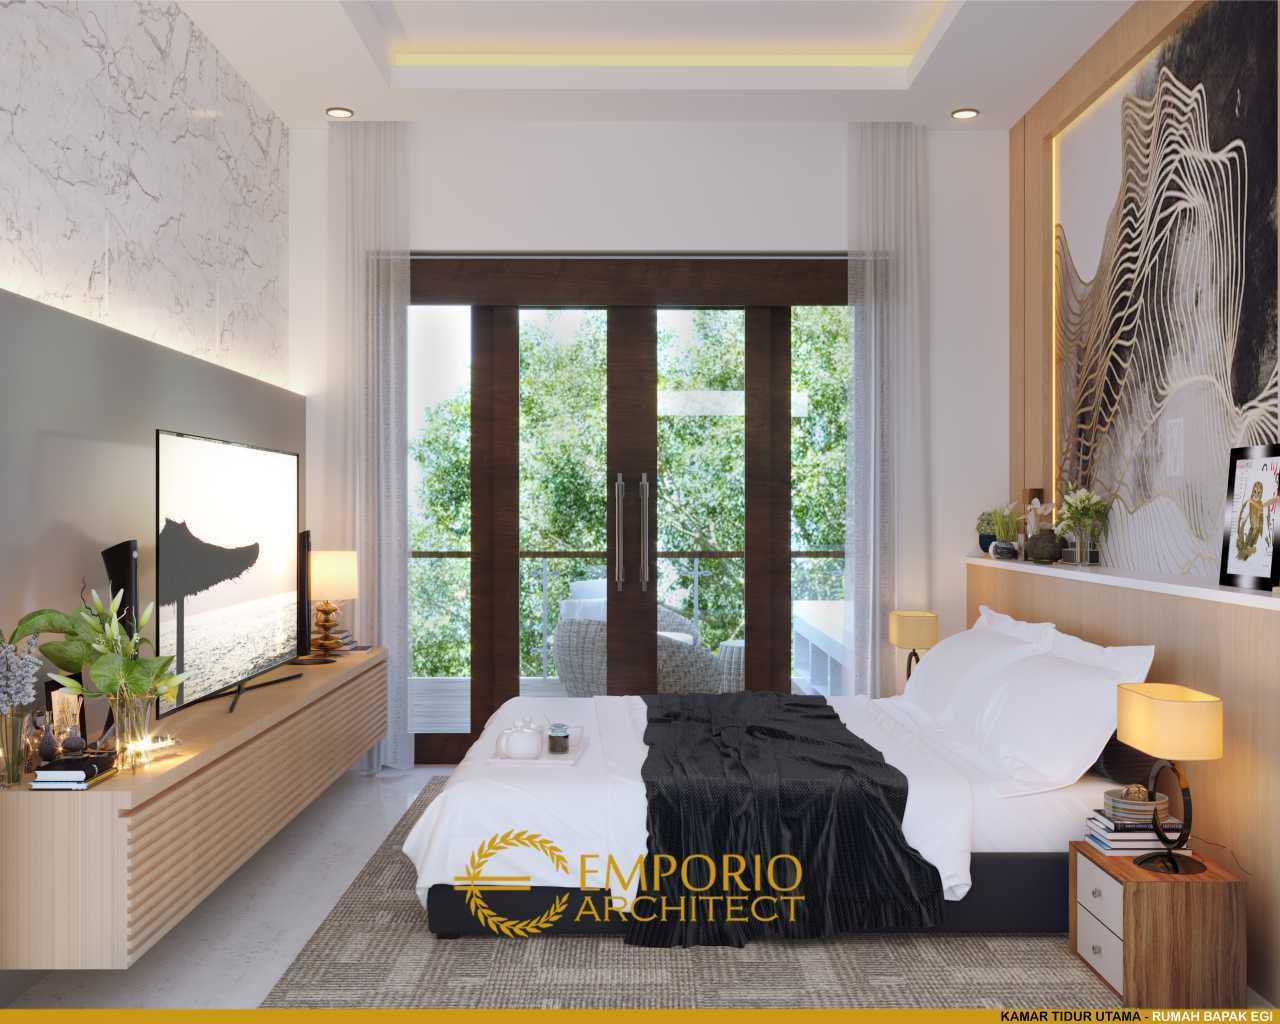 Emporio Architect Jasa Arsitek Denpasar Desain Rumah Modern Tropis 734 @ Denpasar, Bali Kota Denpasar, Bali, Indonesia Kota Denpasar, Bali, Indonesia Emporio-Architect-Jasa-Arsitek-Denpasar-Desain-Rumah-Modern-Tropis-734-Denpasar-Bali  85483